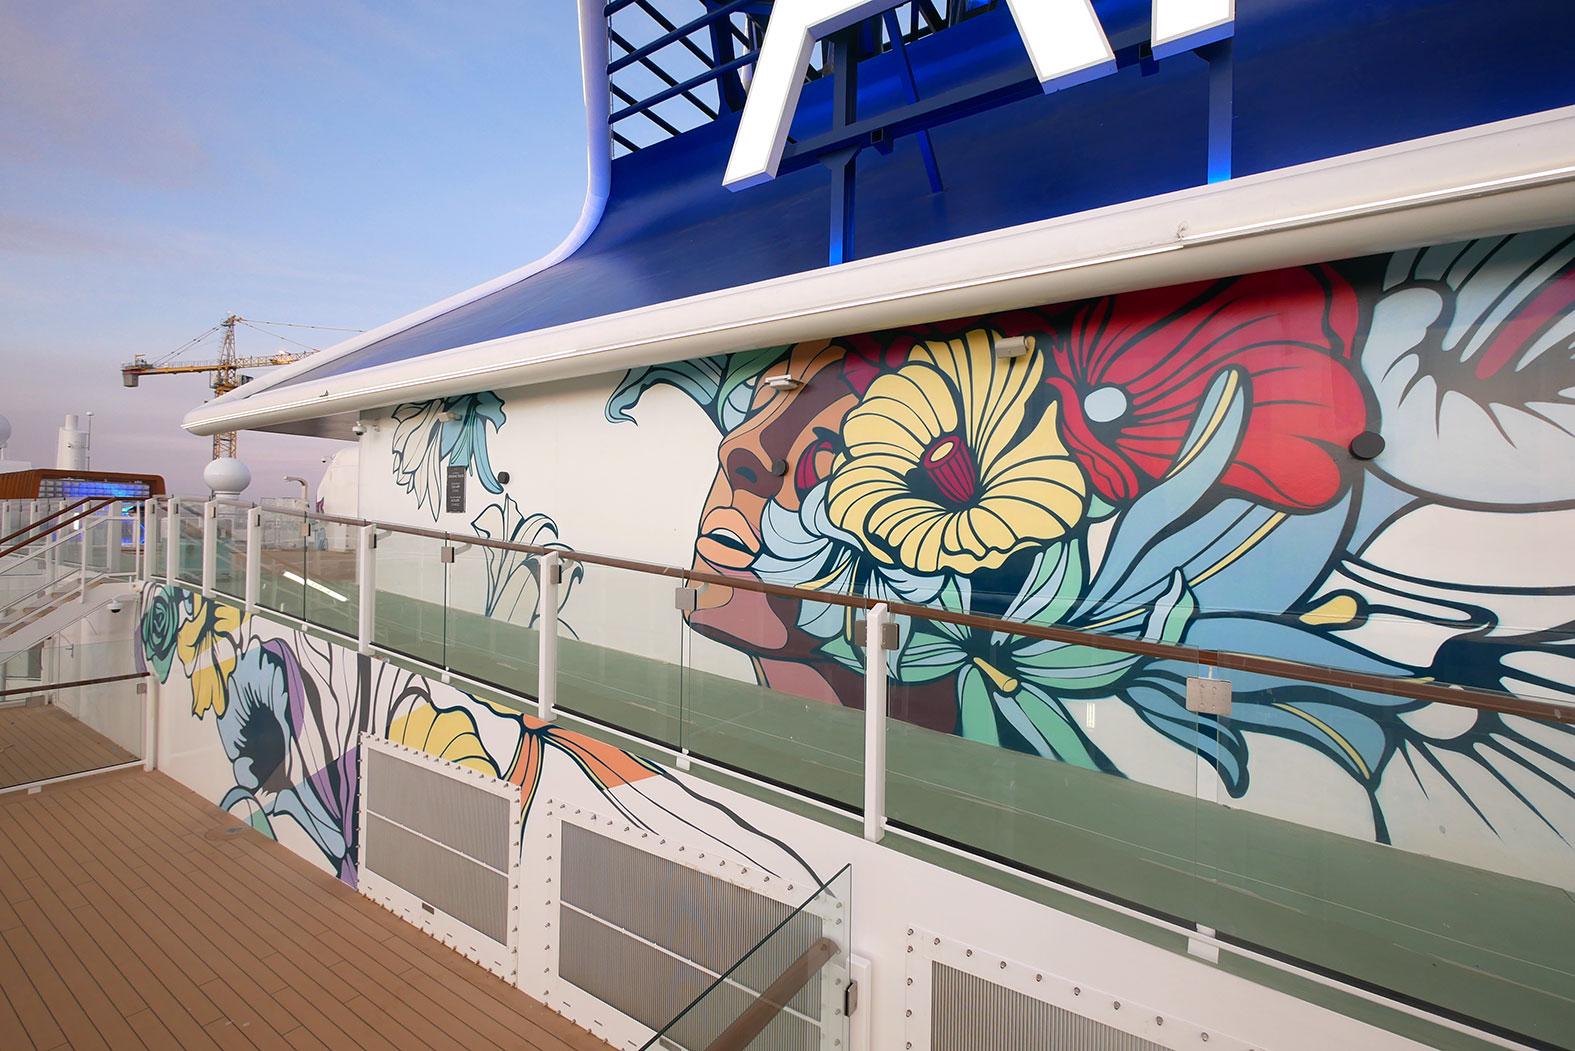 Nerone-apex-celebrity-cruises-21